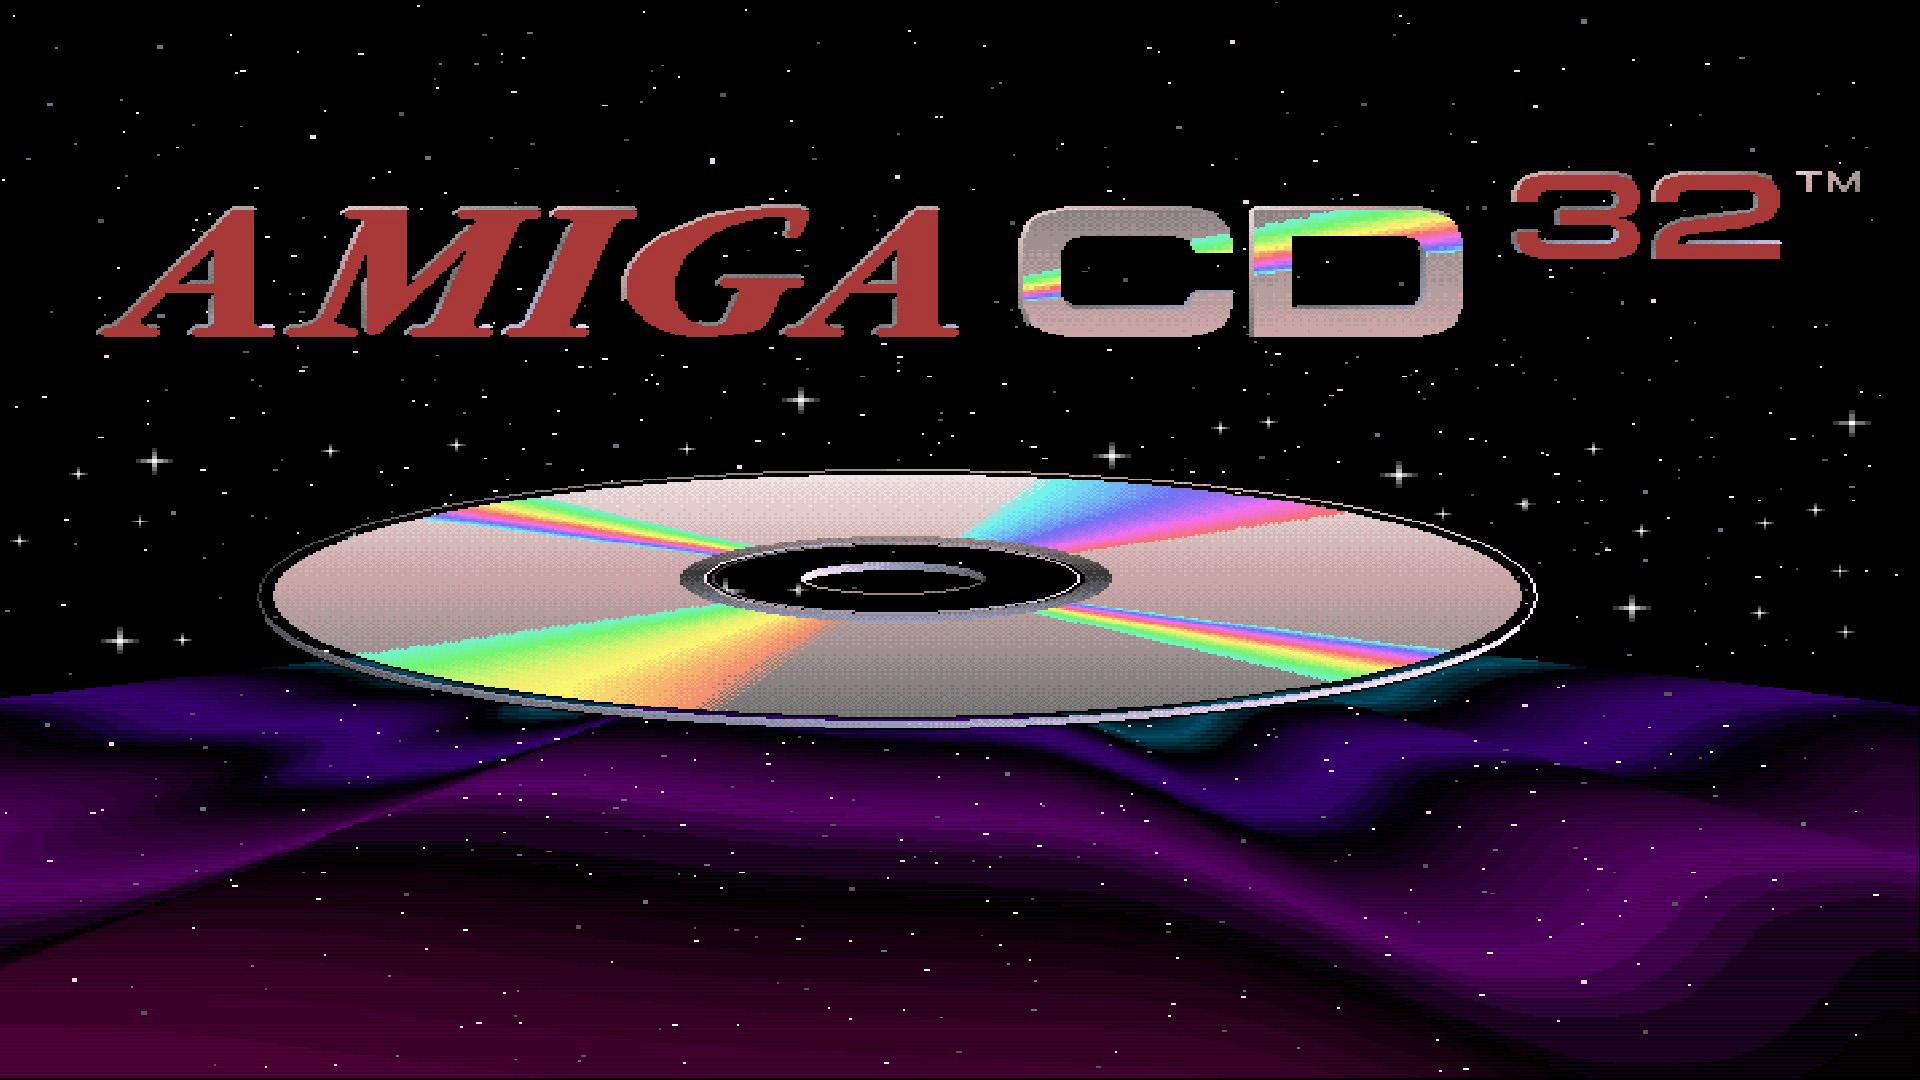 commodore amiga cdtv emulator